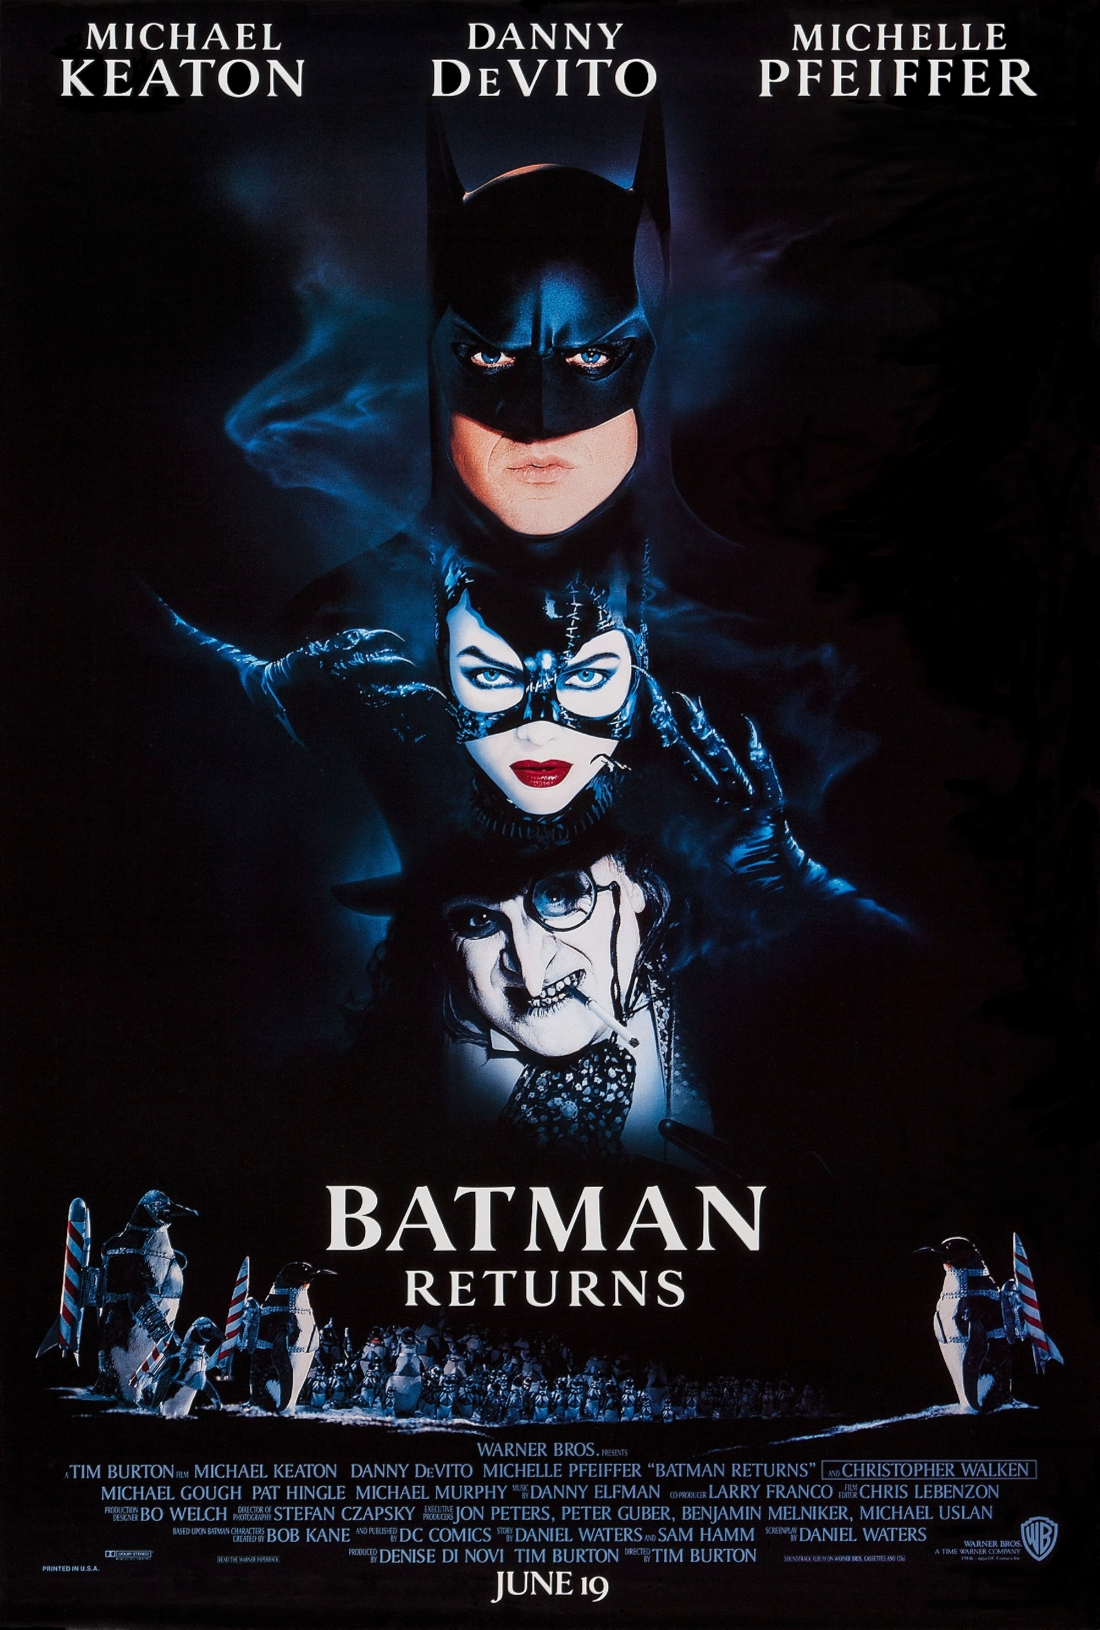 Poster for Carl's Movie Night: Batman Returns